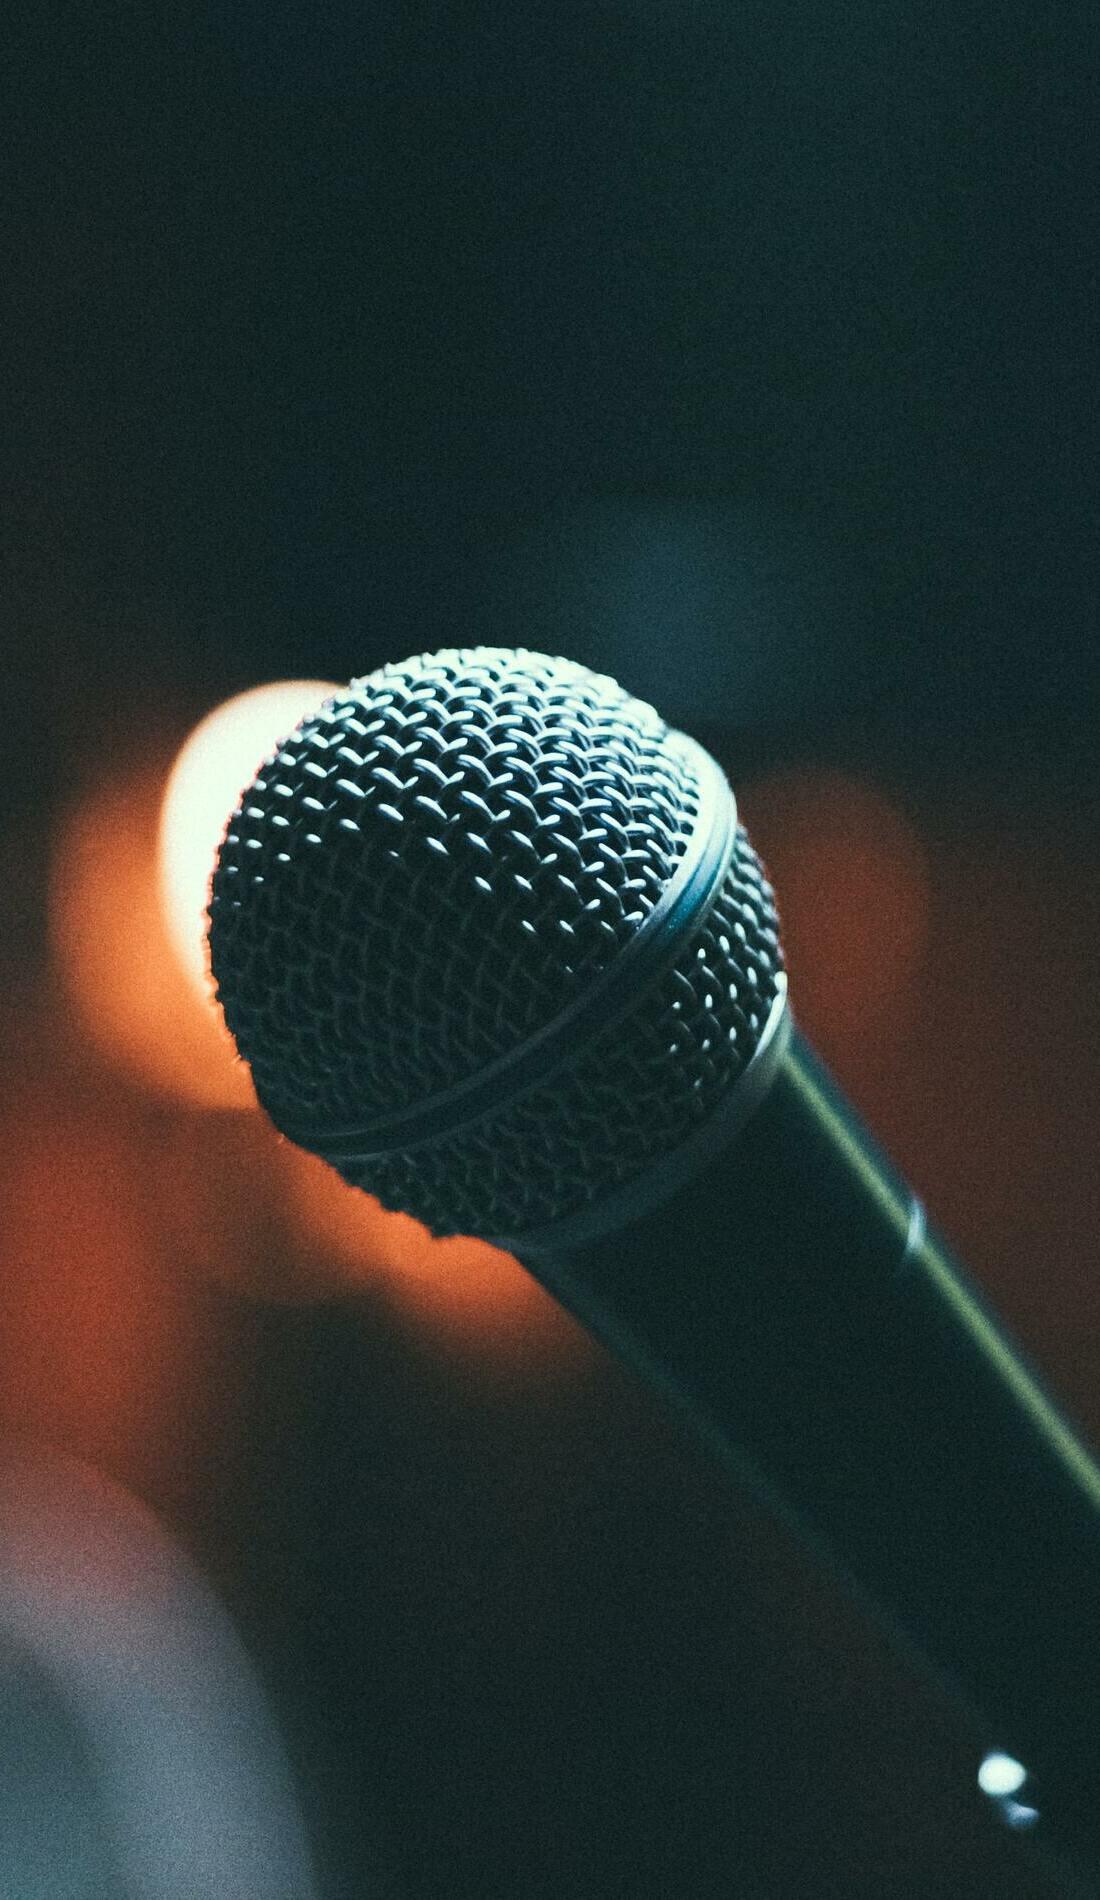 A Latin Grammys live event